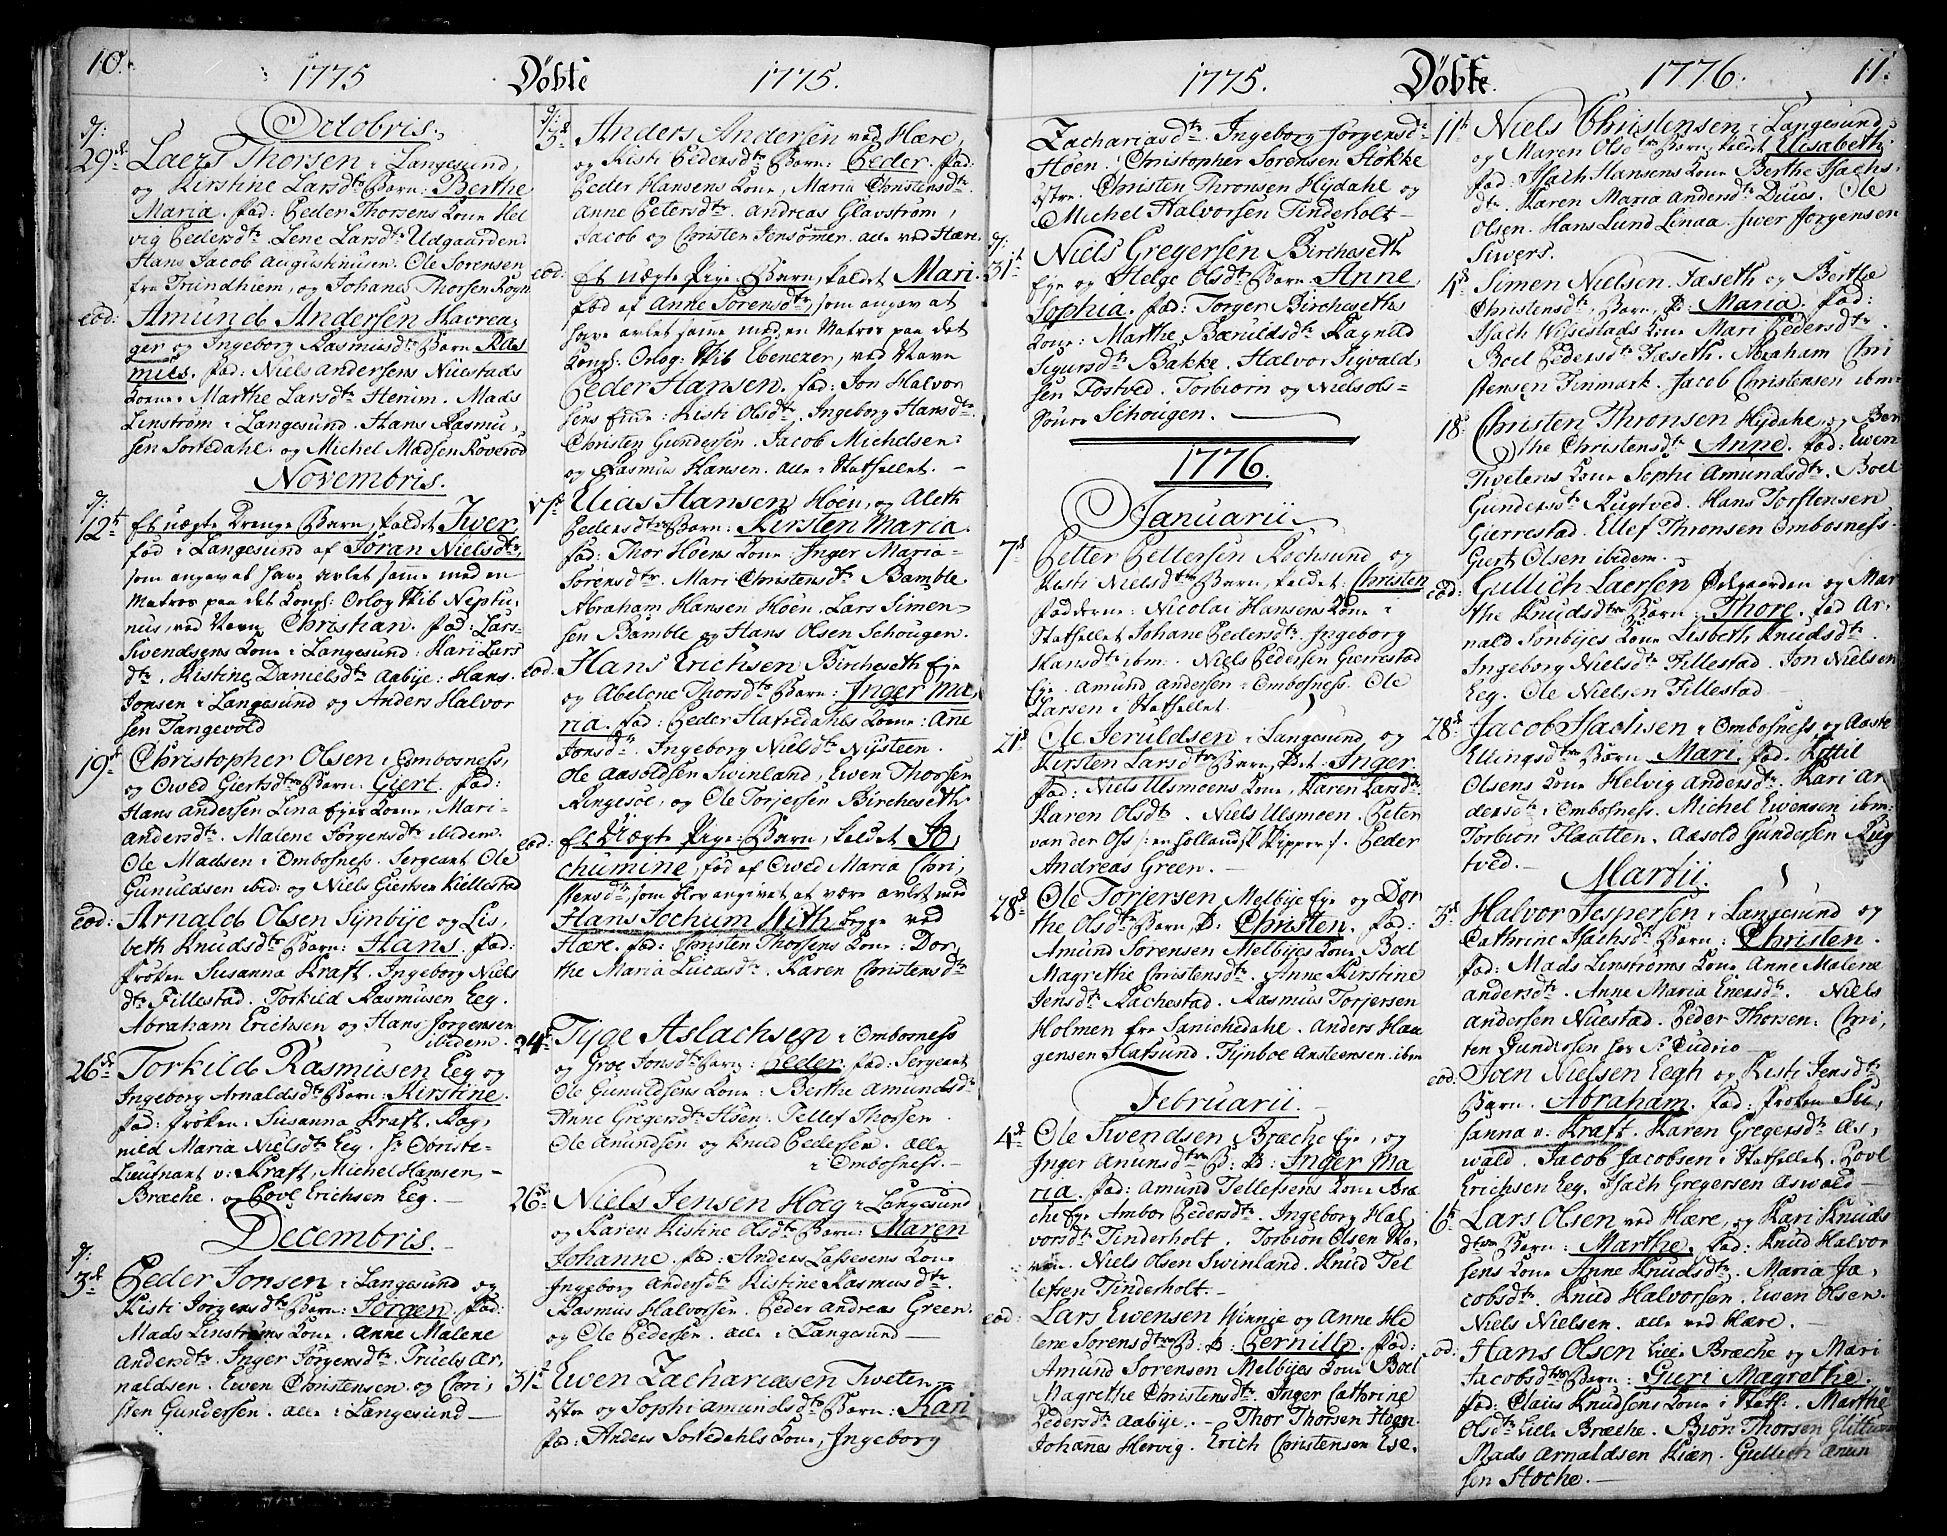 SAKO, Bamble kirkebøker, F/Fa/L0002: Ministerialbok nr. I 2, 1775-1814, s. 10-11